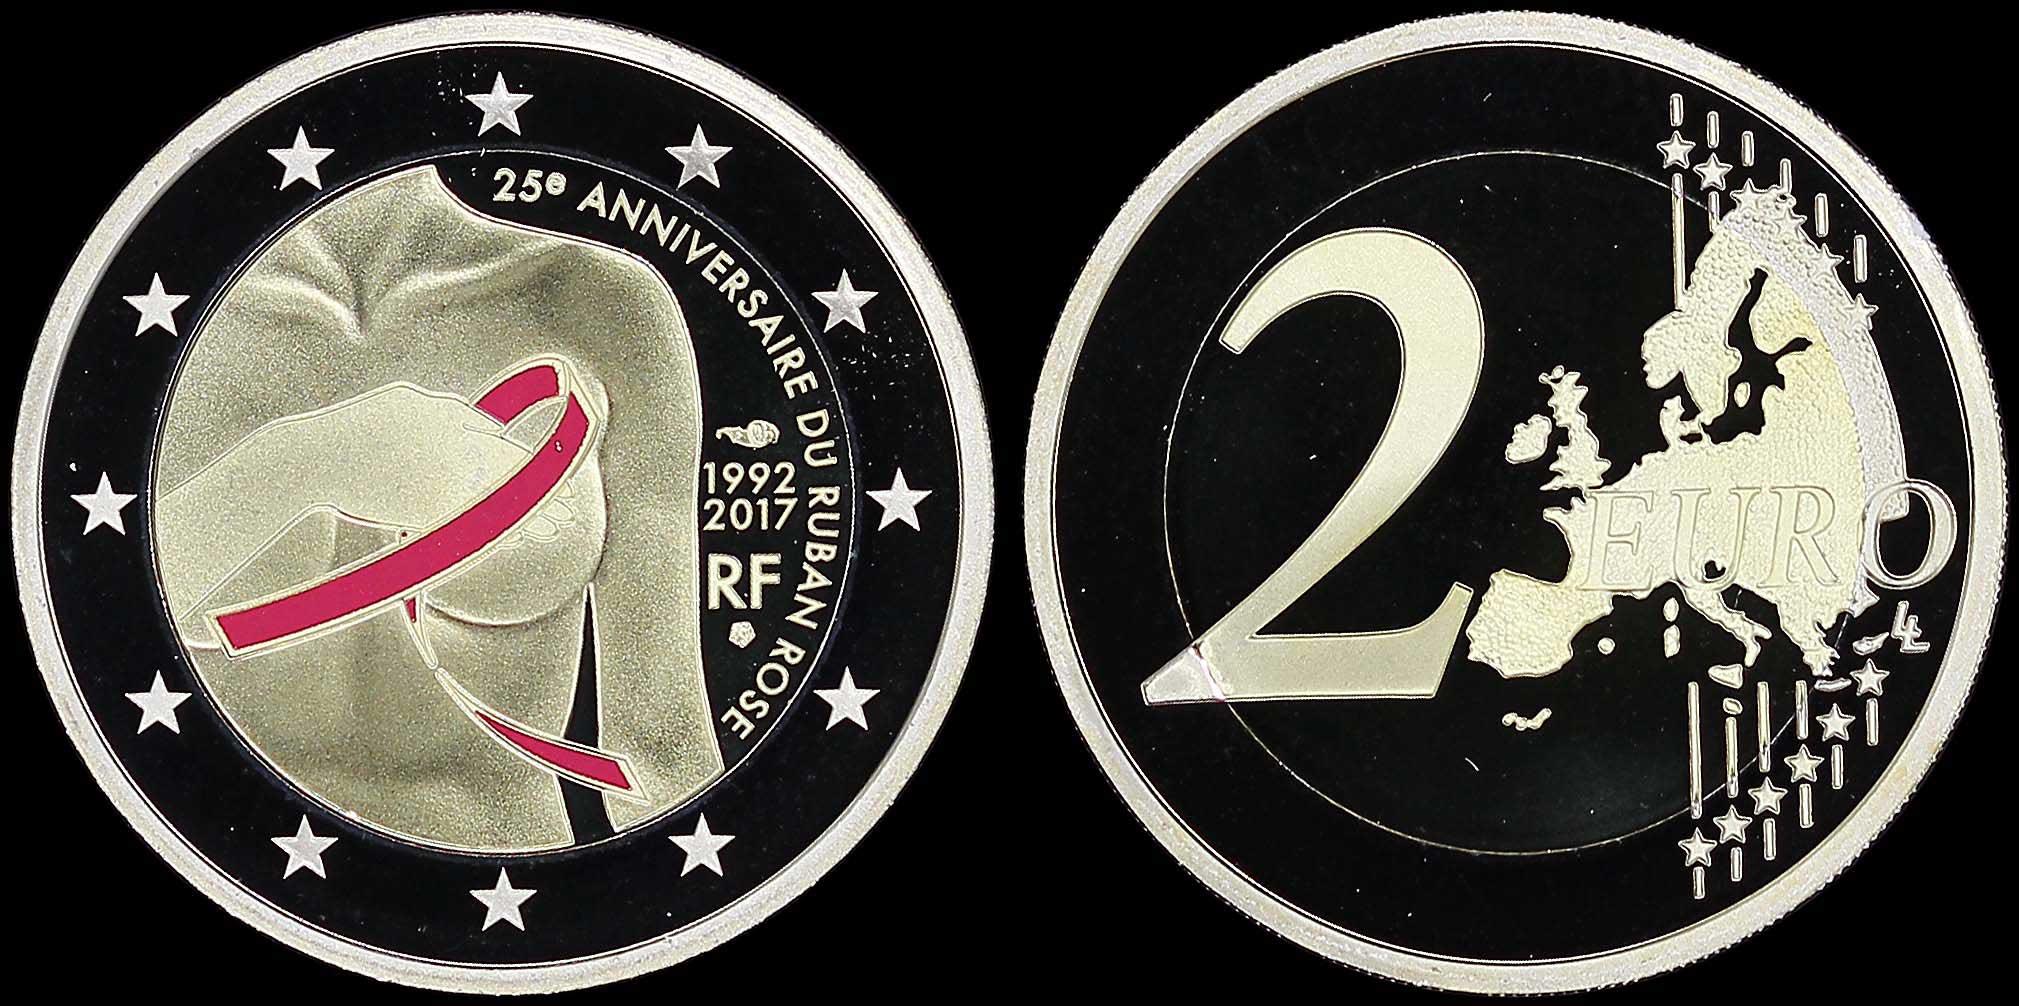 Lot 6874 - -  COINS & TOKENS COINS & TOKENS OF EUROPEAN COUNTRIES -  A. Karamitsos Postal & Live Internet Auction 984 (Part B)